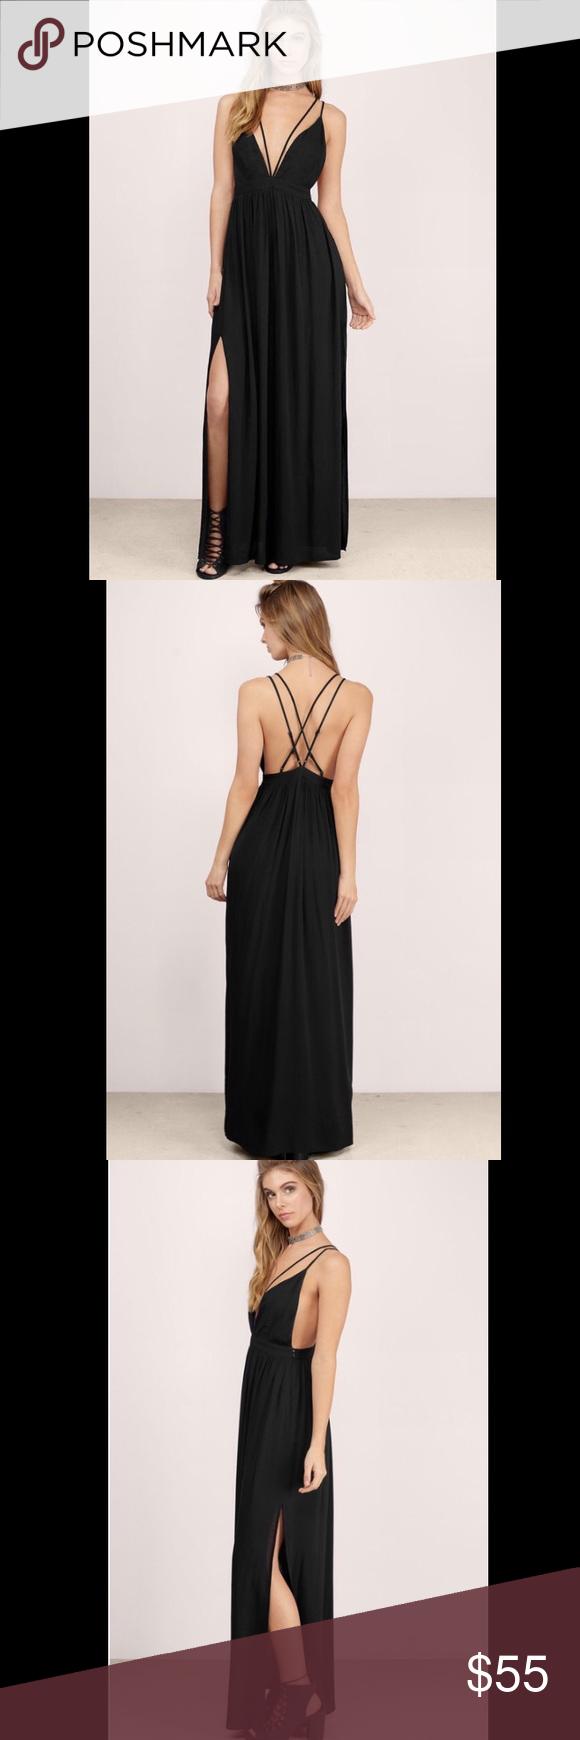 Elegant long black formal dress nwt neckline maxis and tags